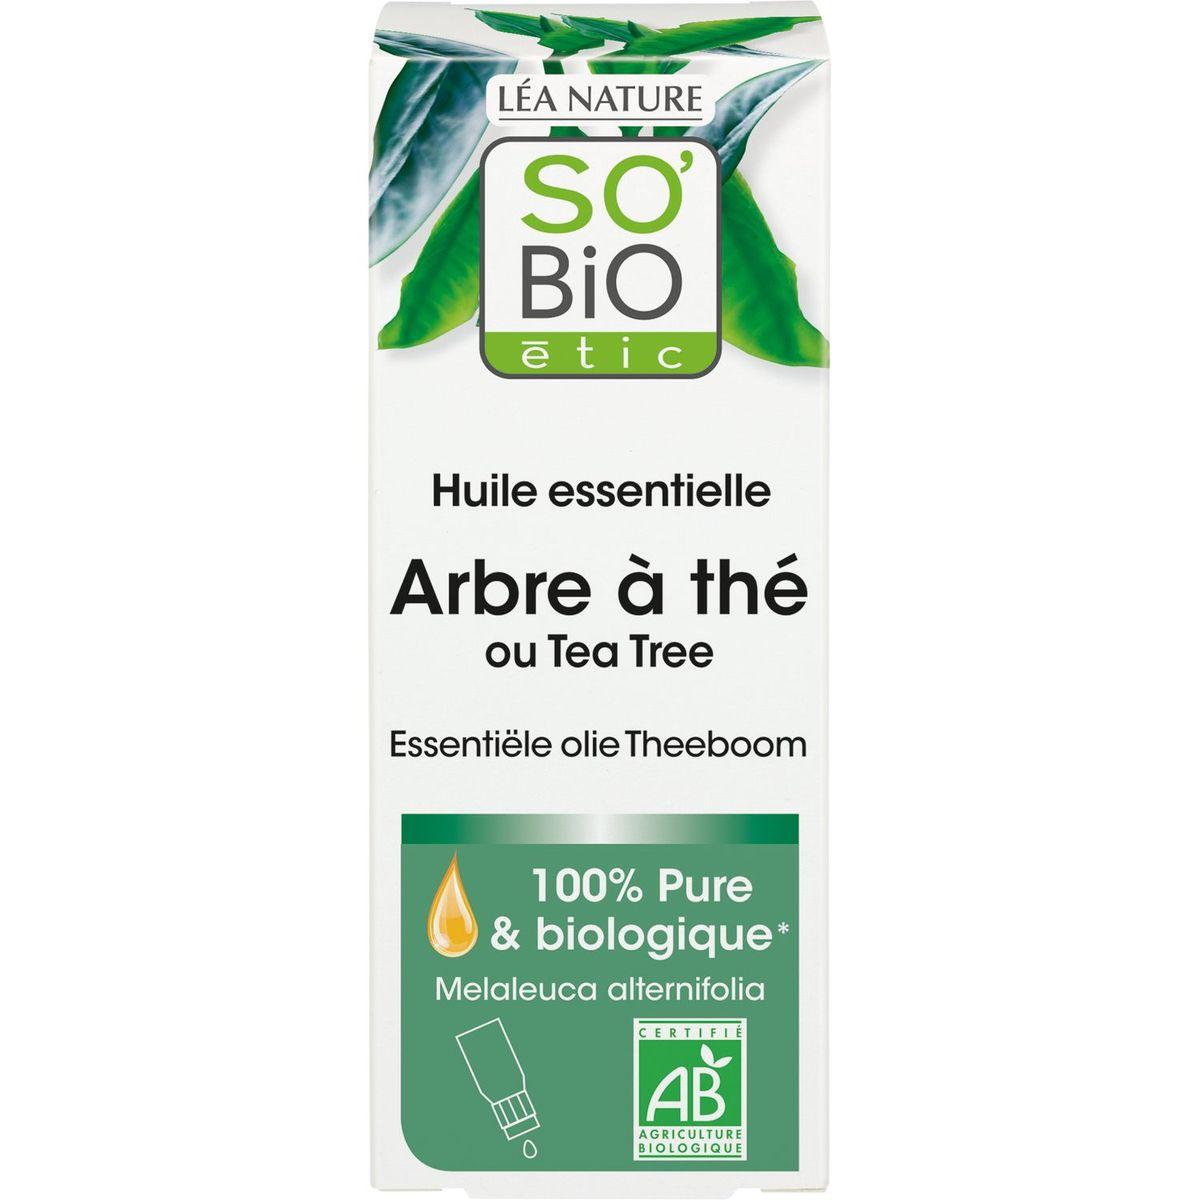 So Bio Etic Huile essentielle arbre à thé 15ml